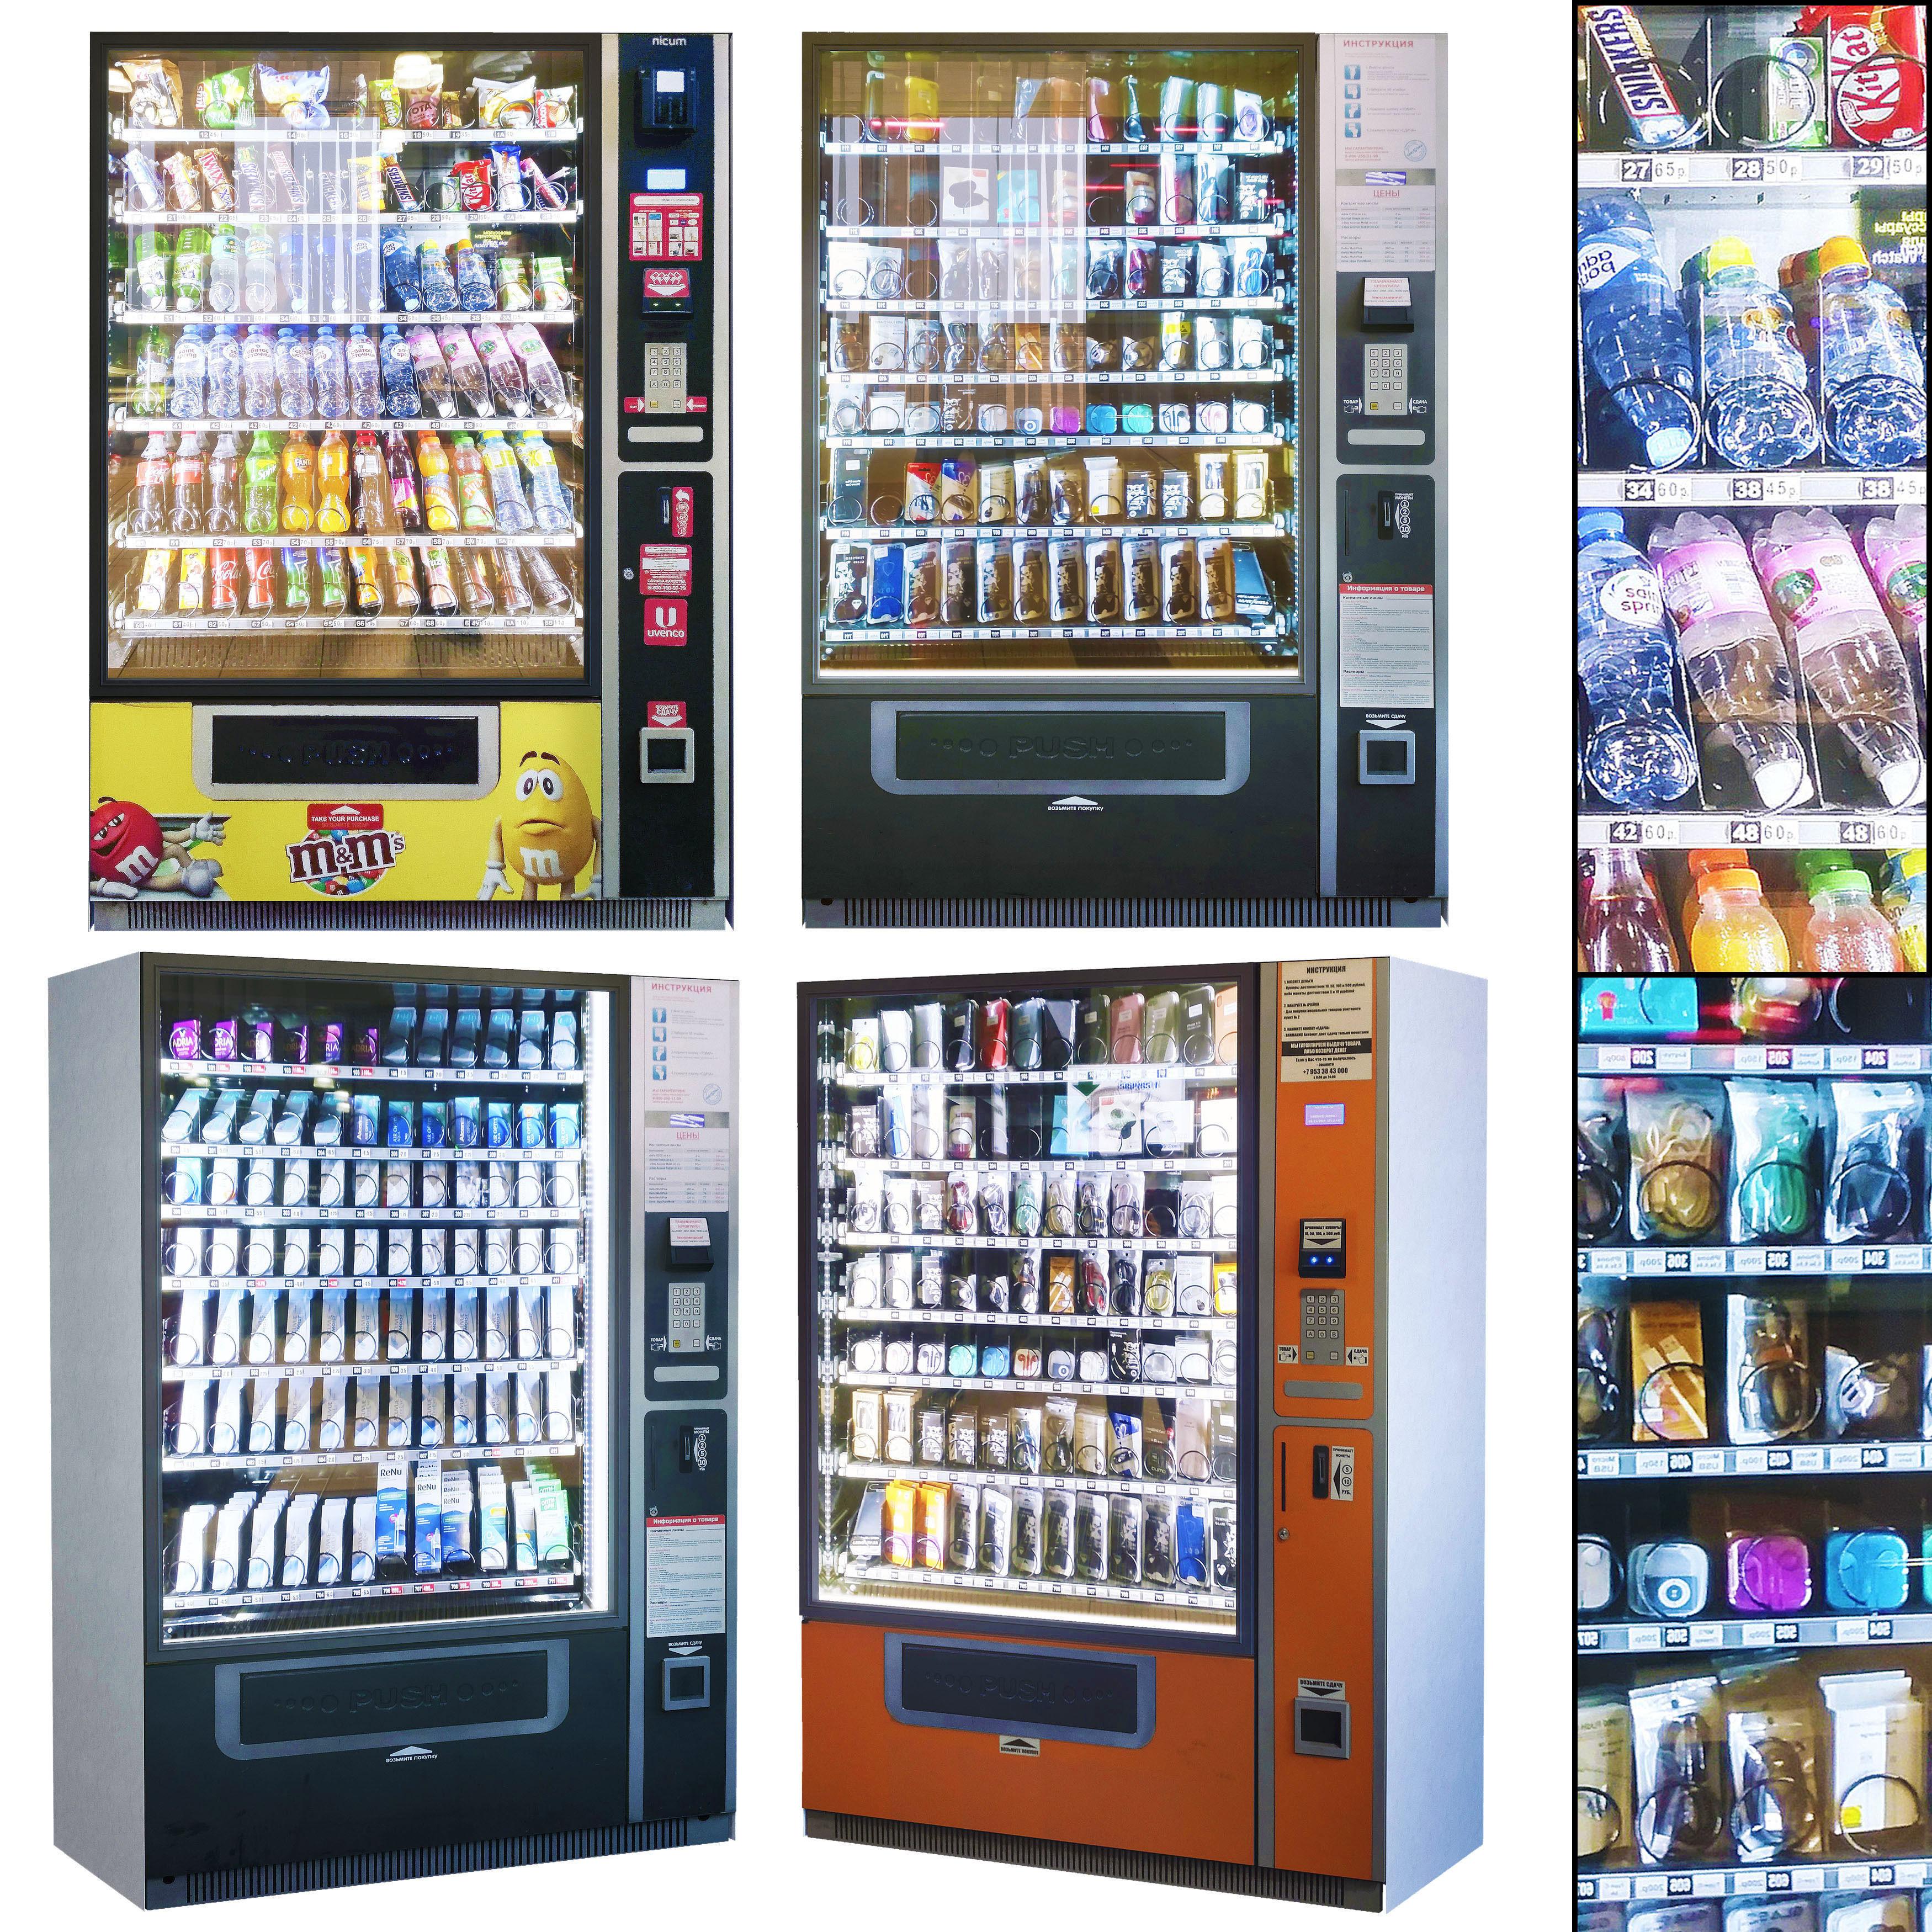 Showcase 014 Vending machine